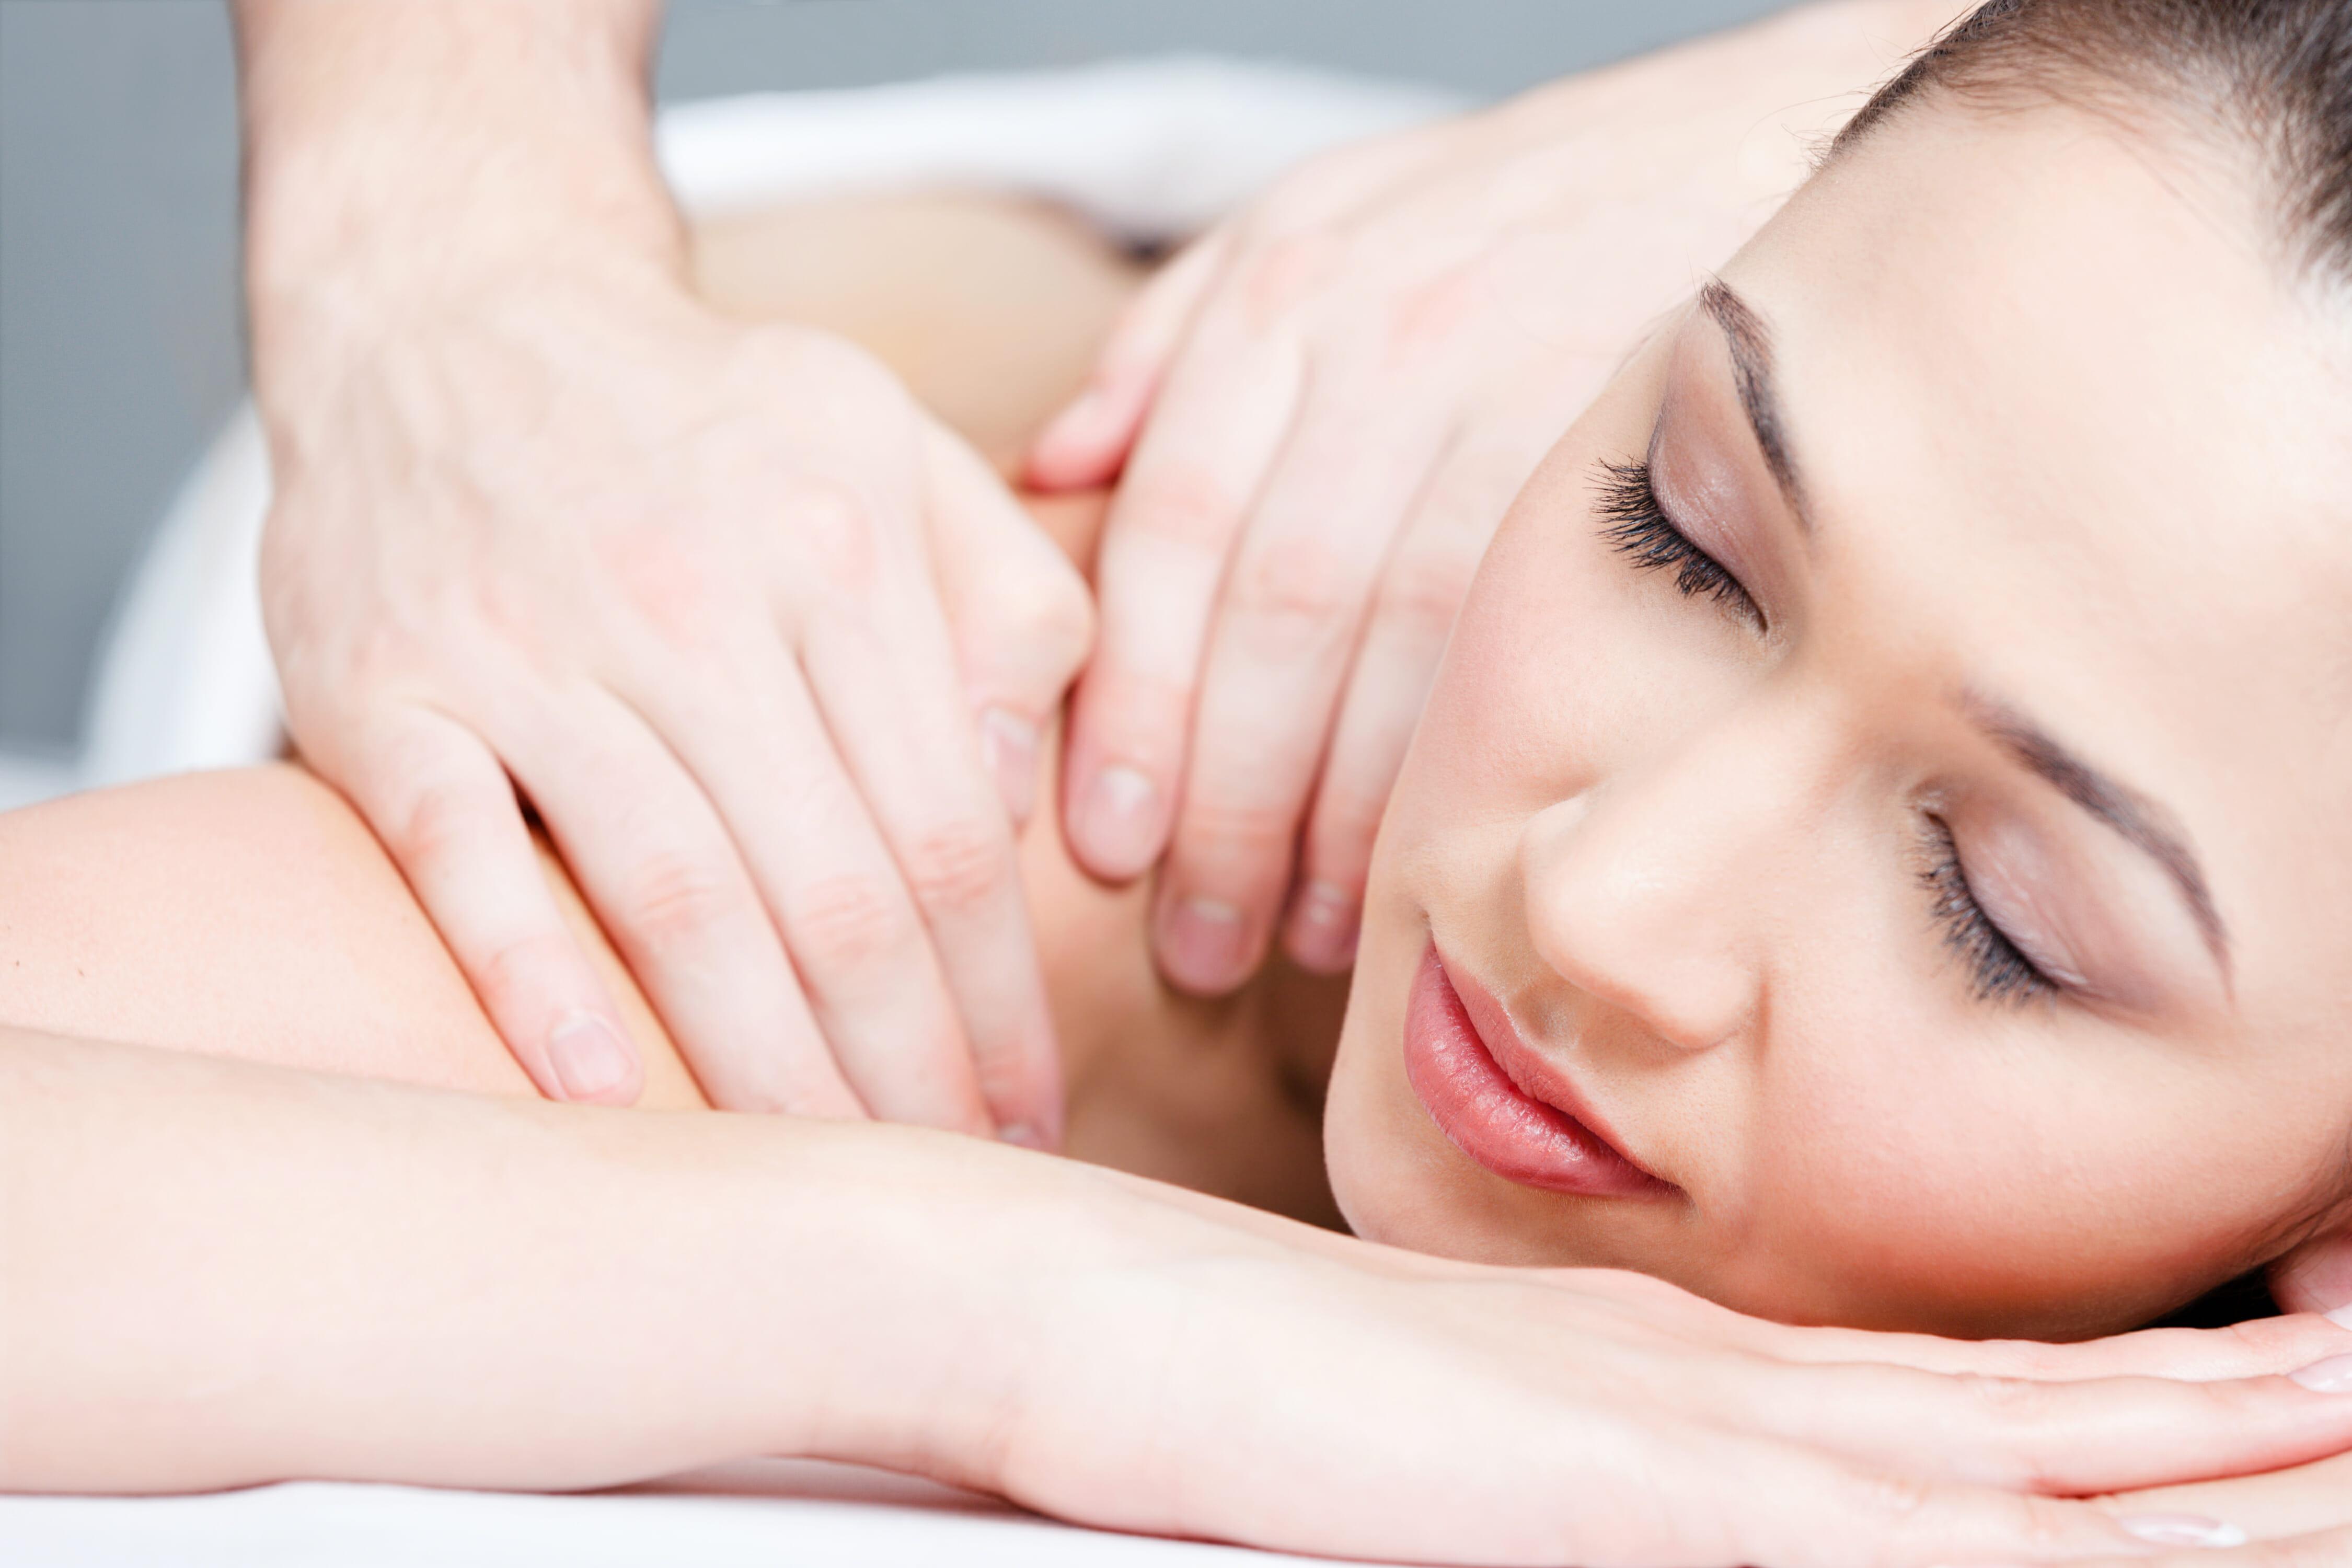 Massage willow wellbeing torquay devon hot stone swedish lava shell deep tissue